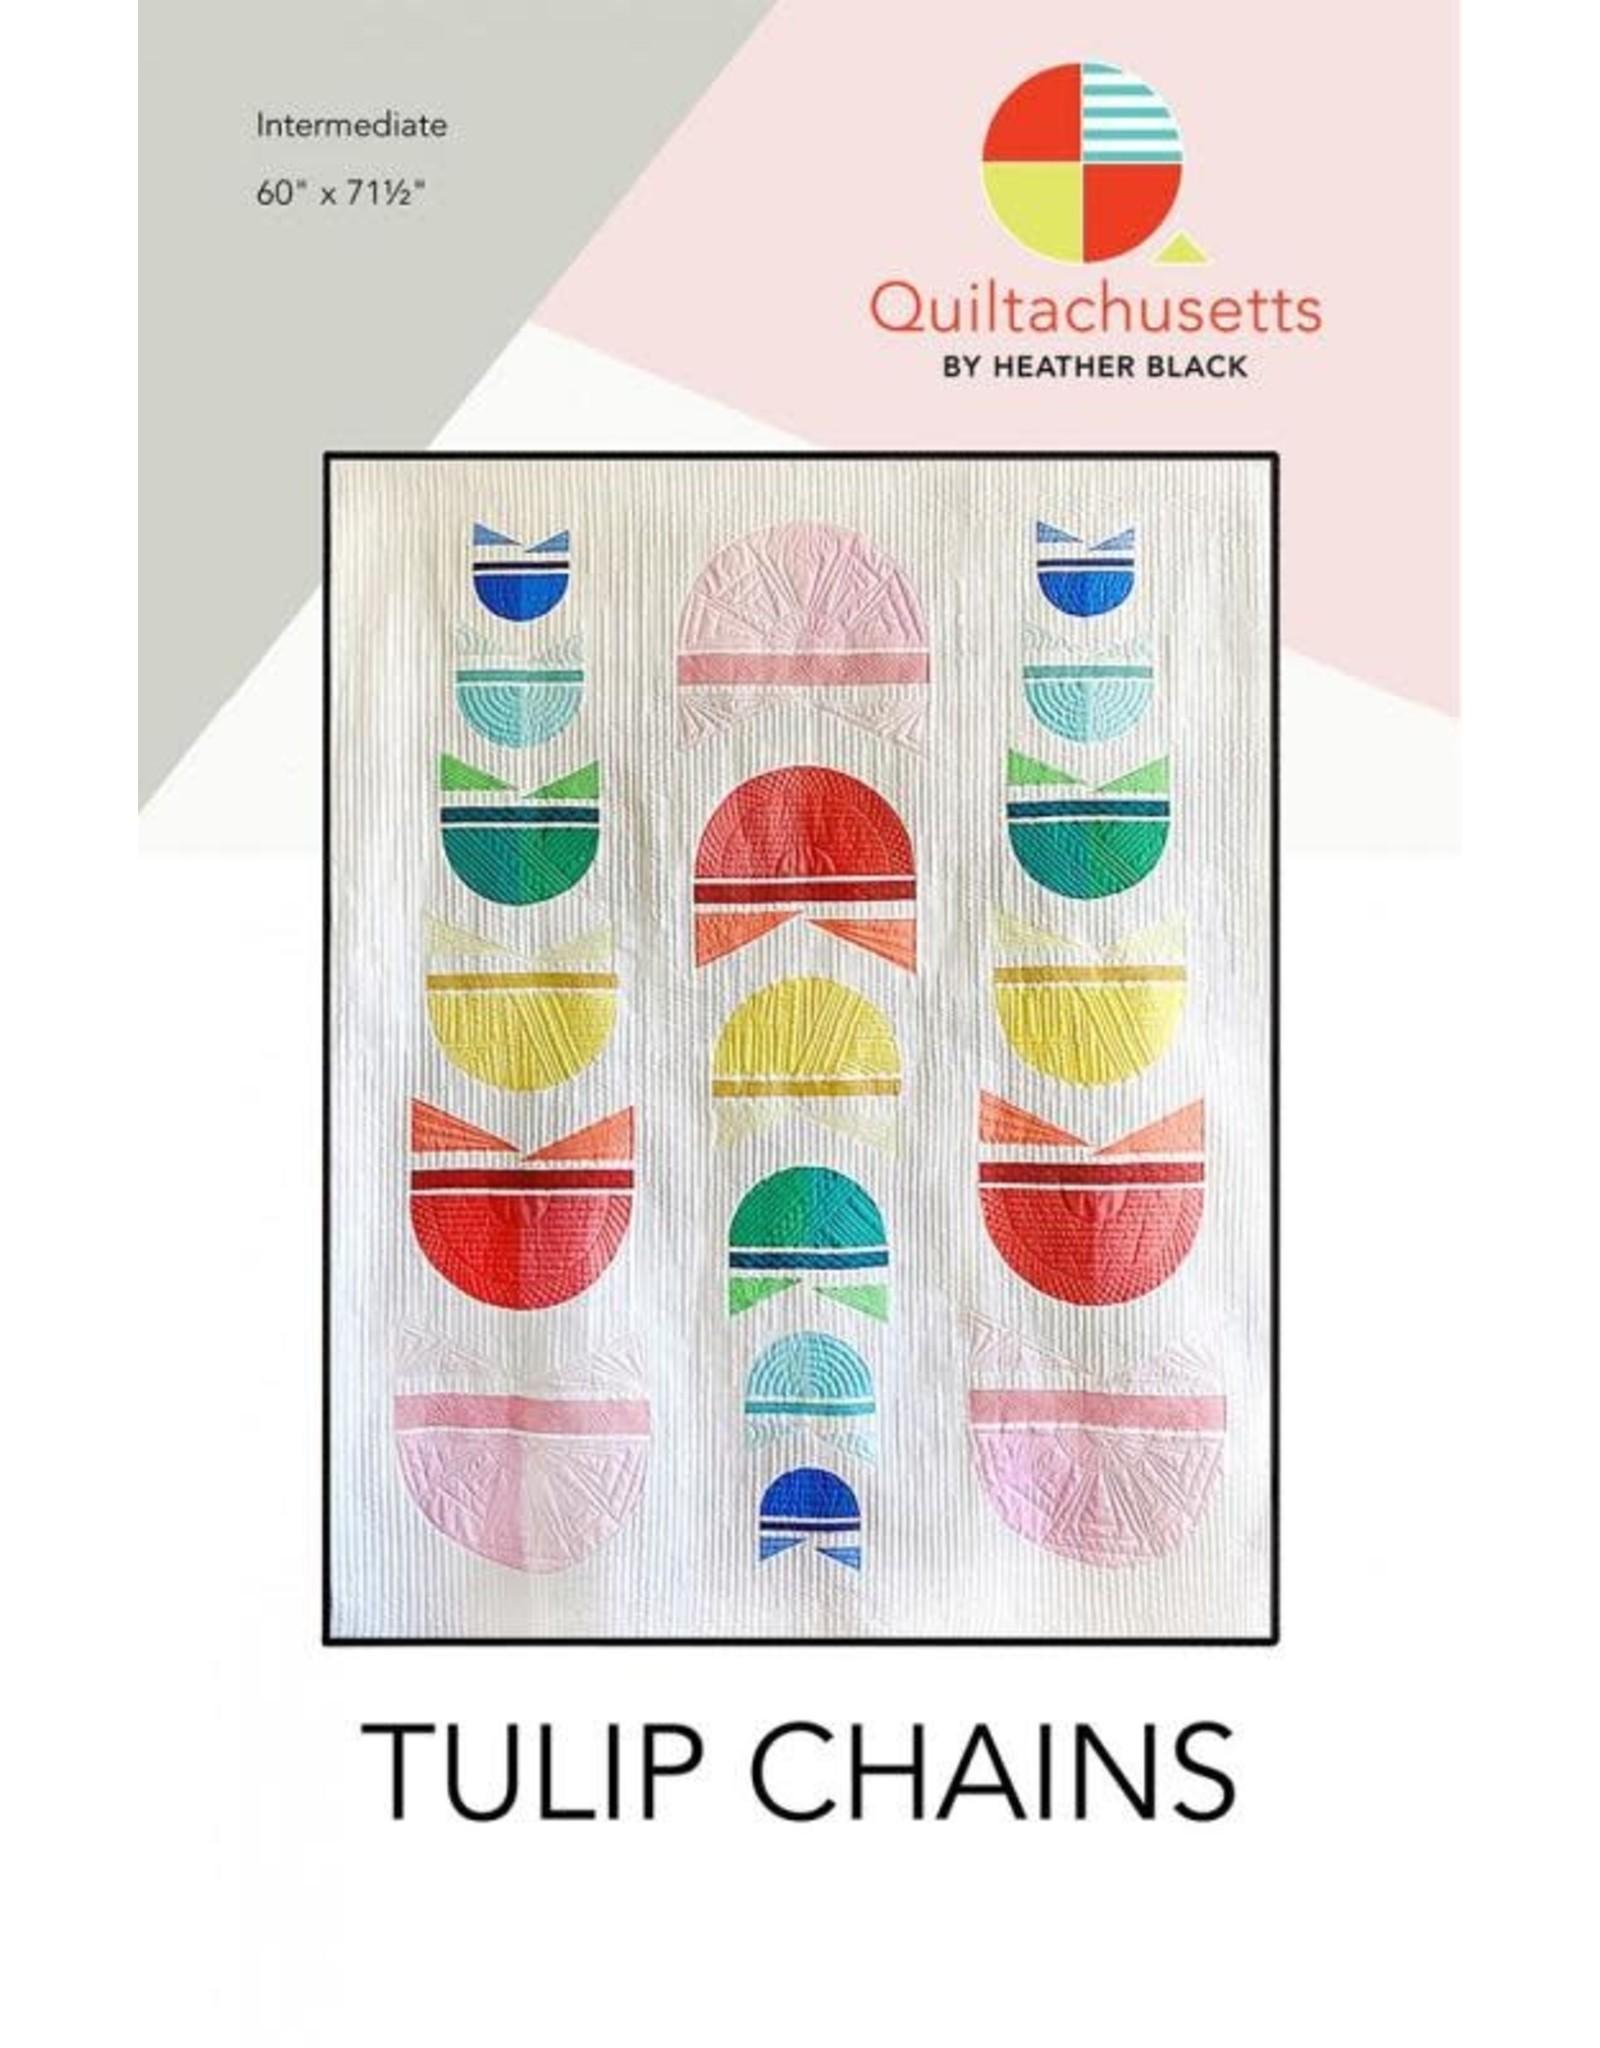 Quiltachusetts Tulip Chains Quilt Pattern